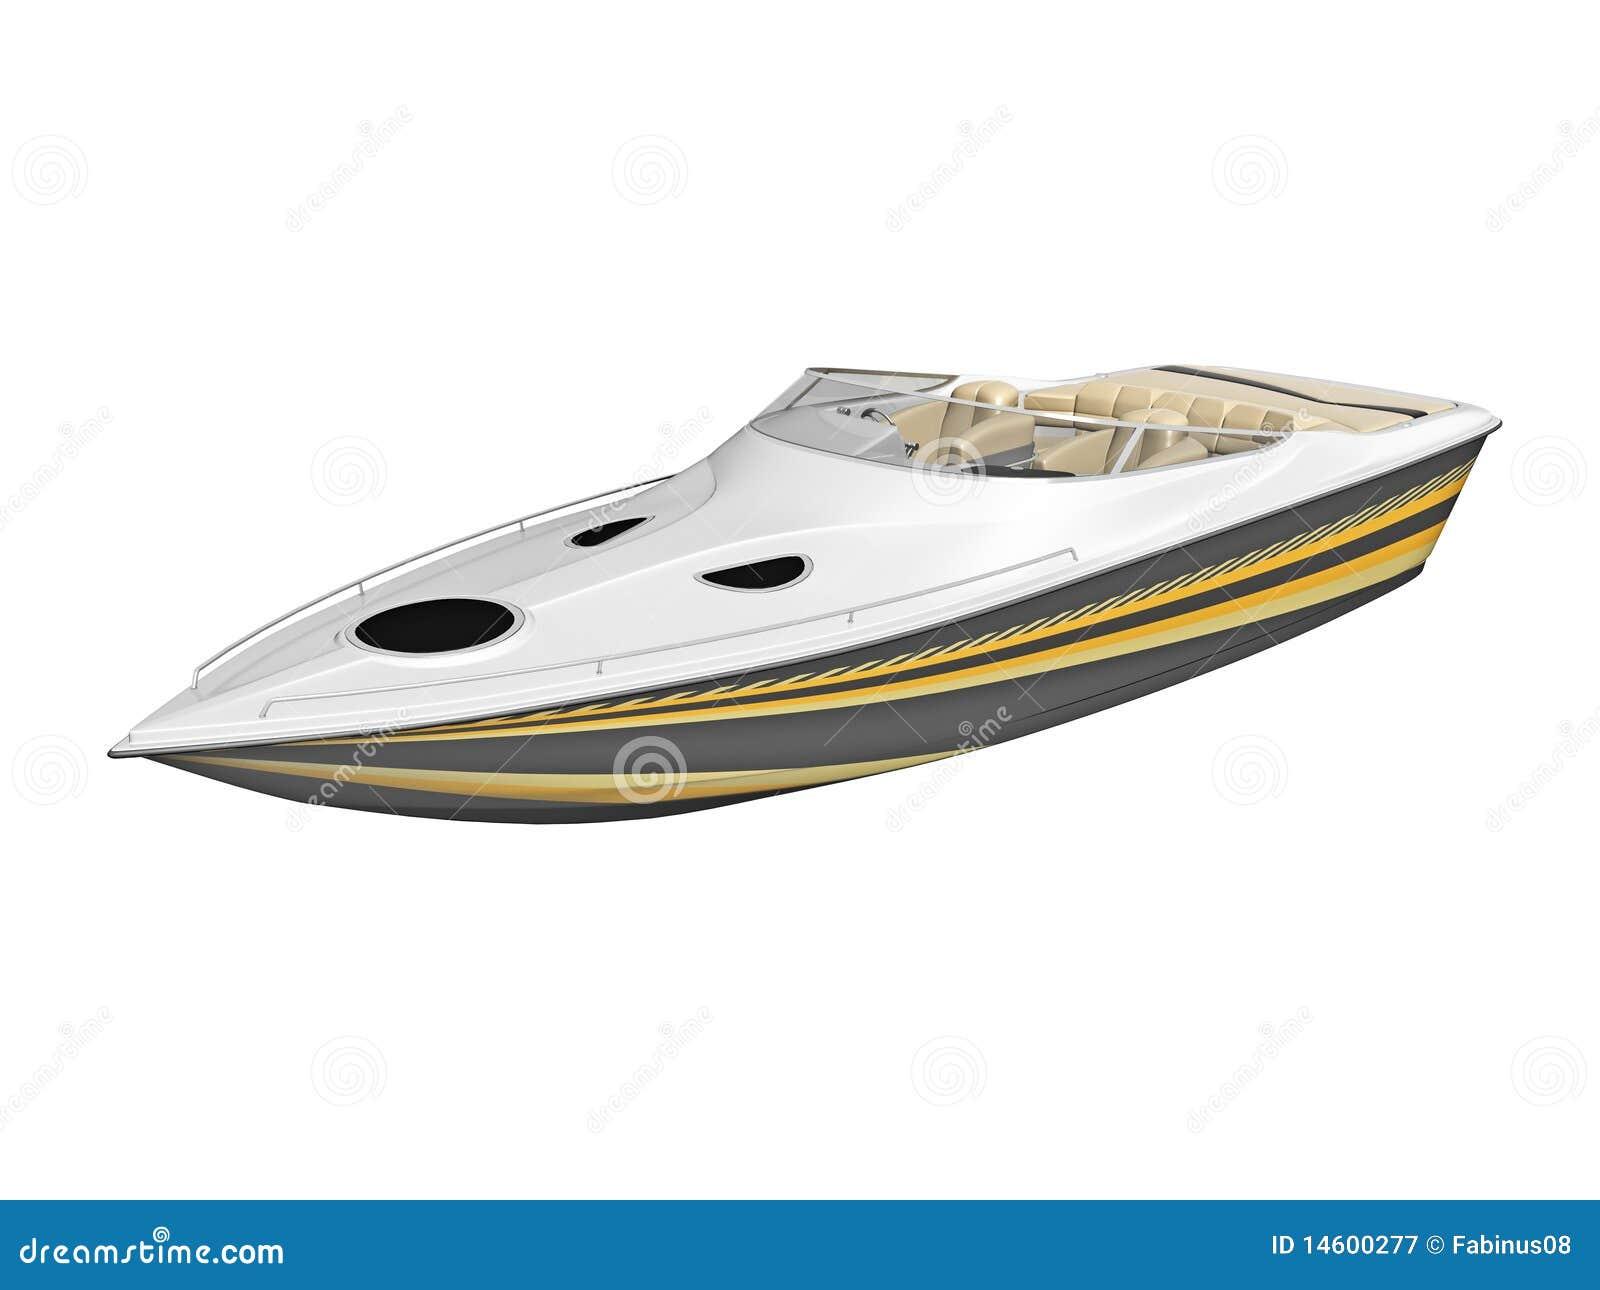 Luxury speed boat stock illustration. Illustration of machine - 14600277